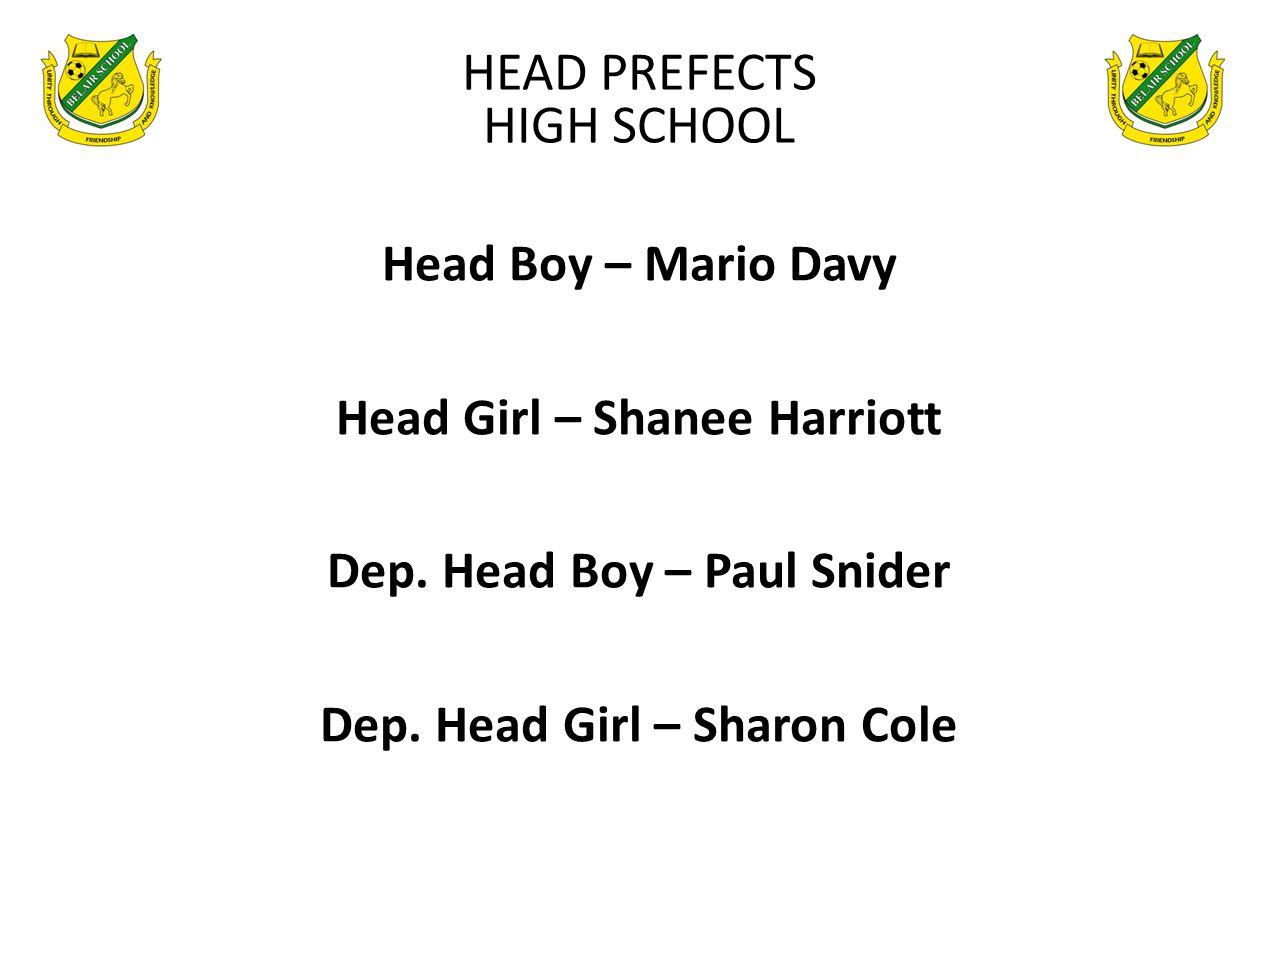 Head Boy – Mario Davy Head Girl – Shanee Harriott Dep. Head Boy – Paul Snider Dep. Head Girl – Sharon Cole HEAD PREFECTS HIGH SCHOOL